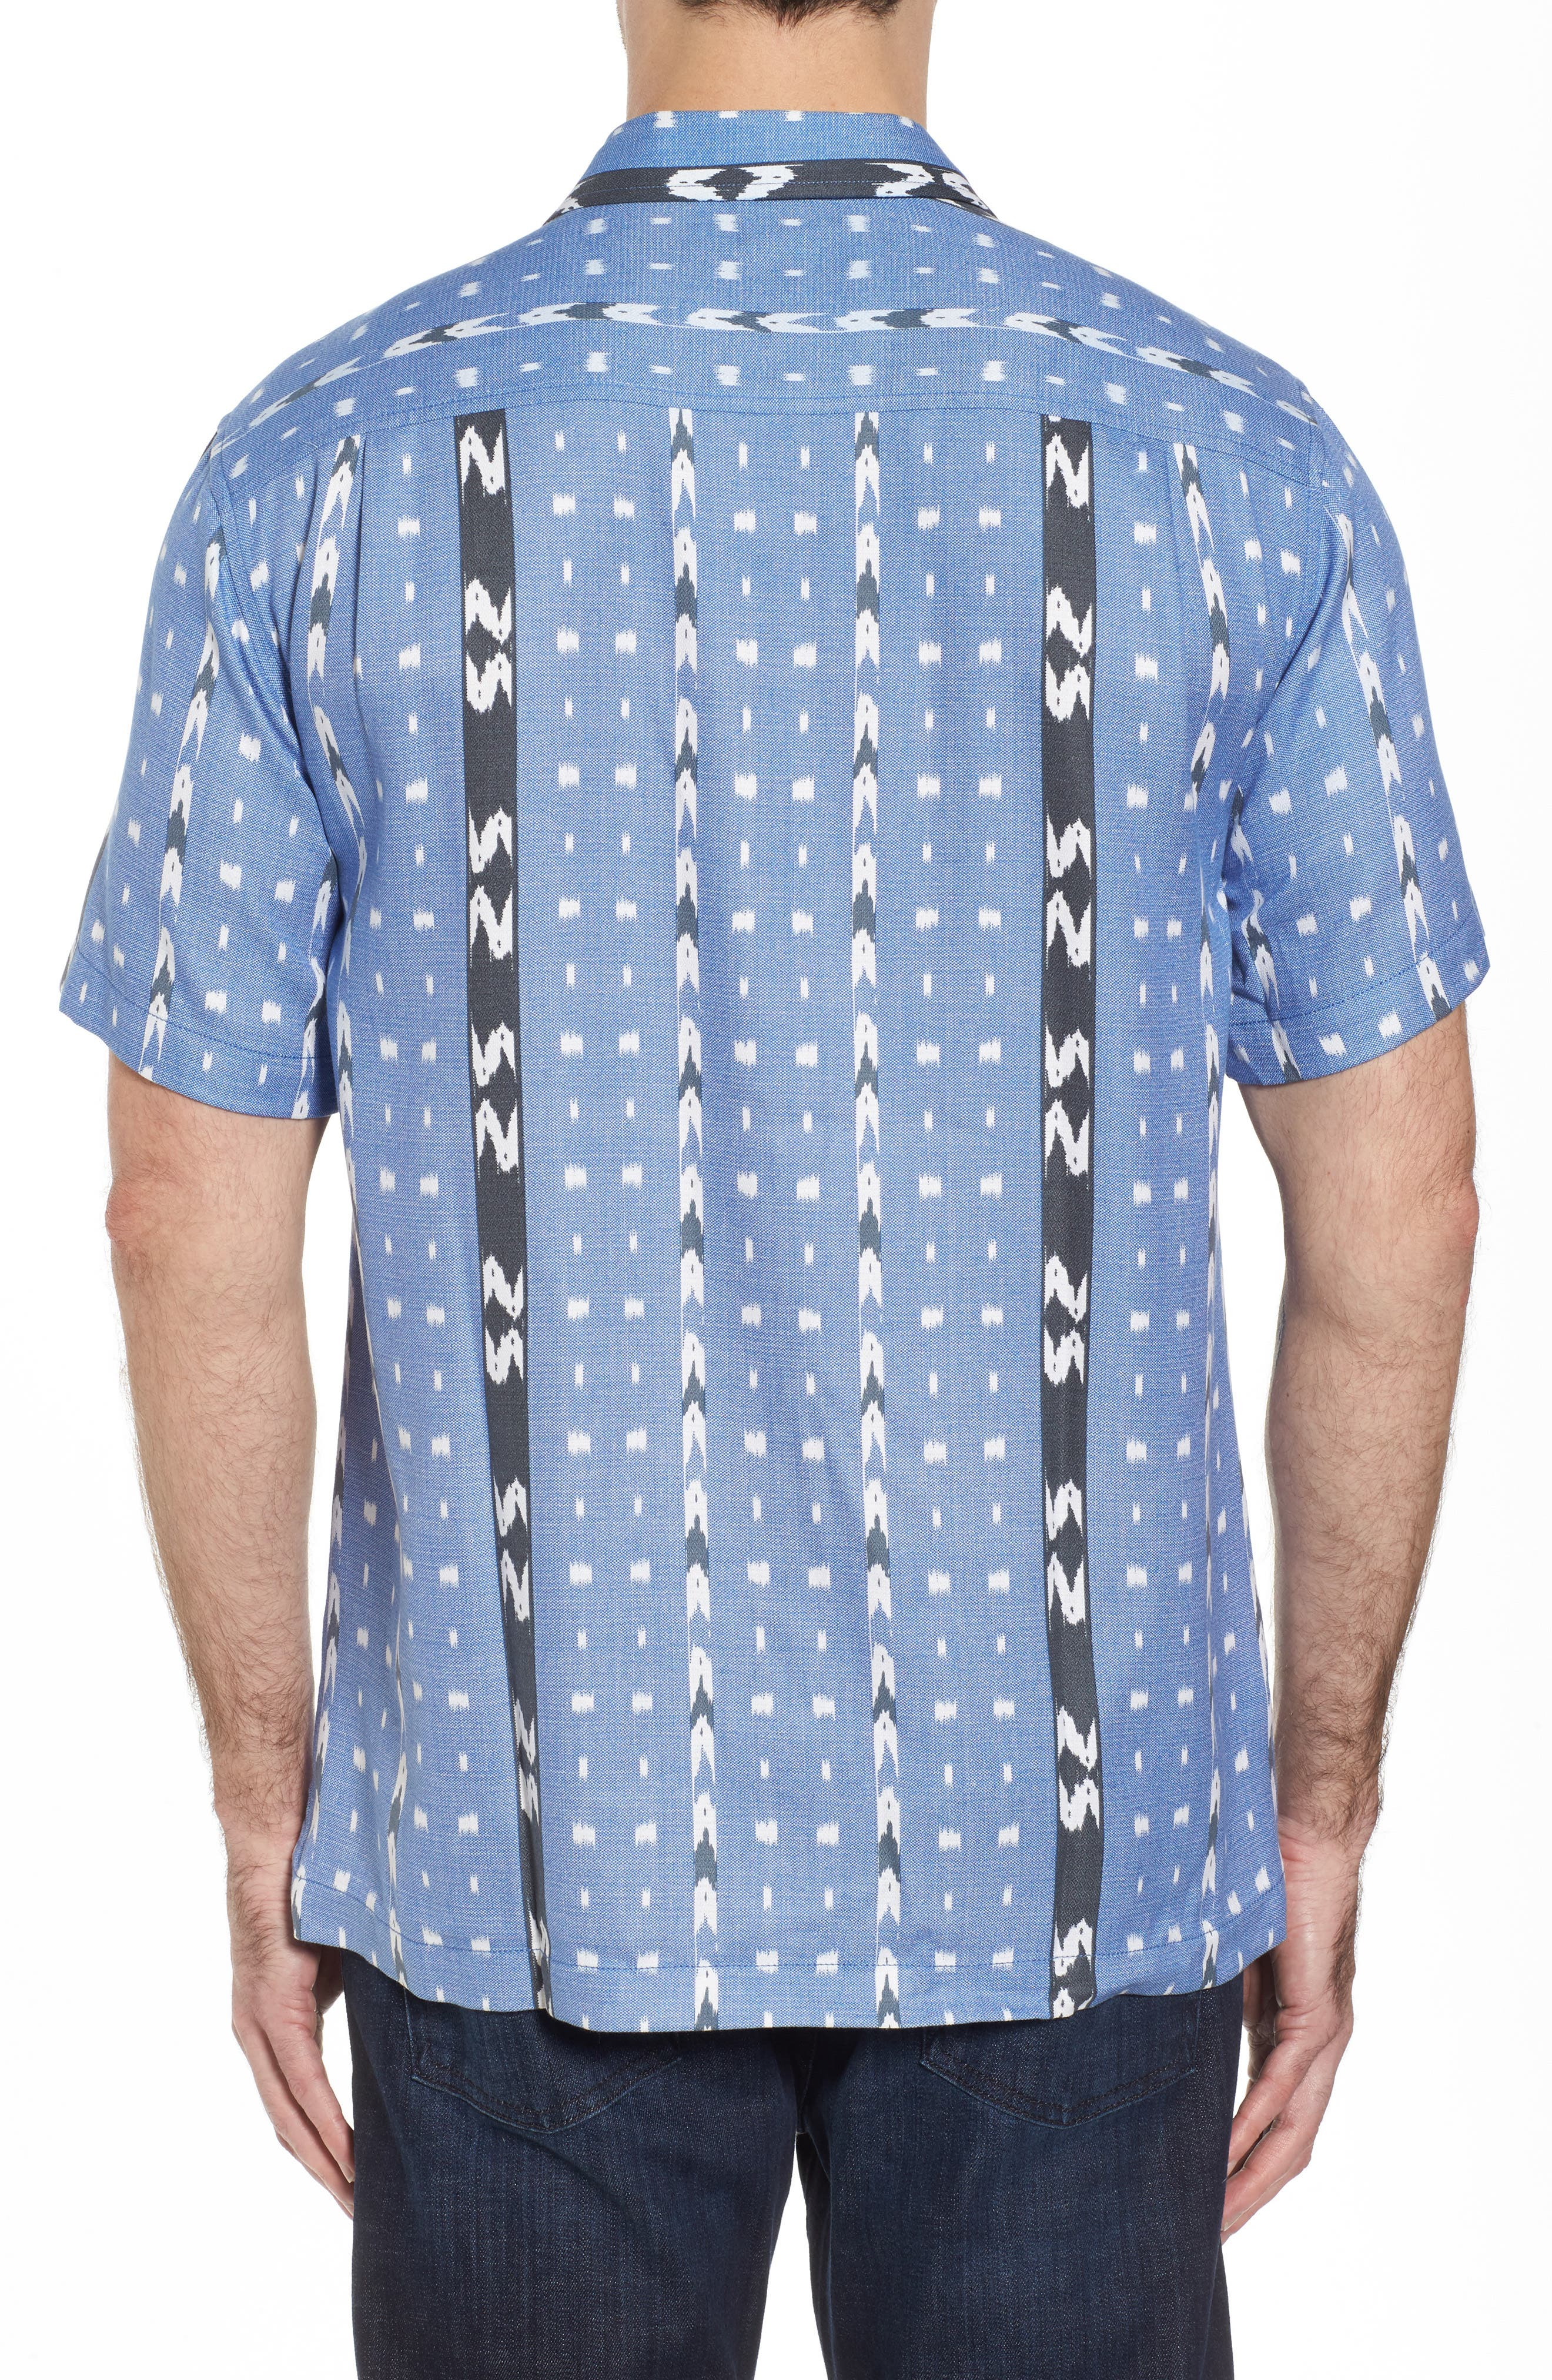 Alternate Image 2  - Tommy Bahama Ikat Don't Stop Silk Blend Camp Shirt